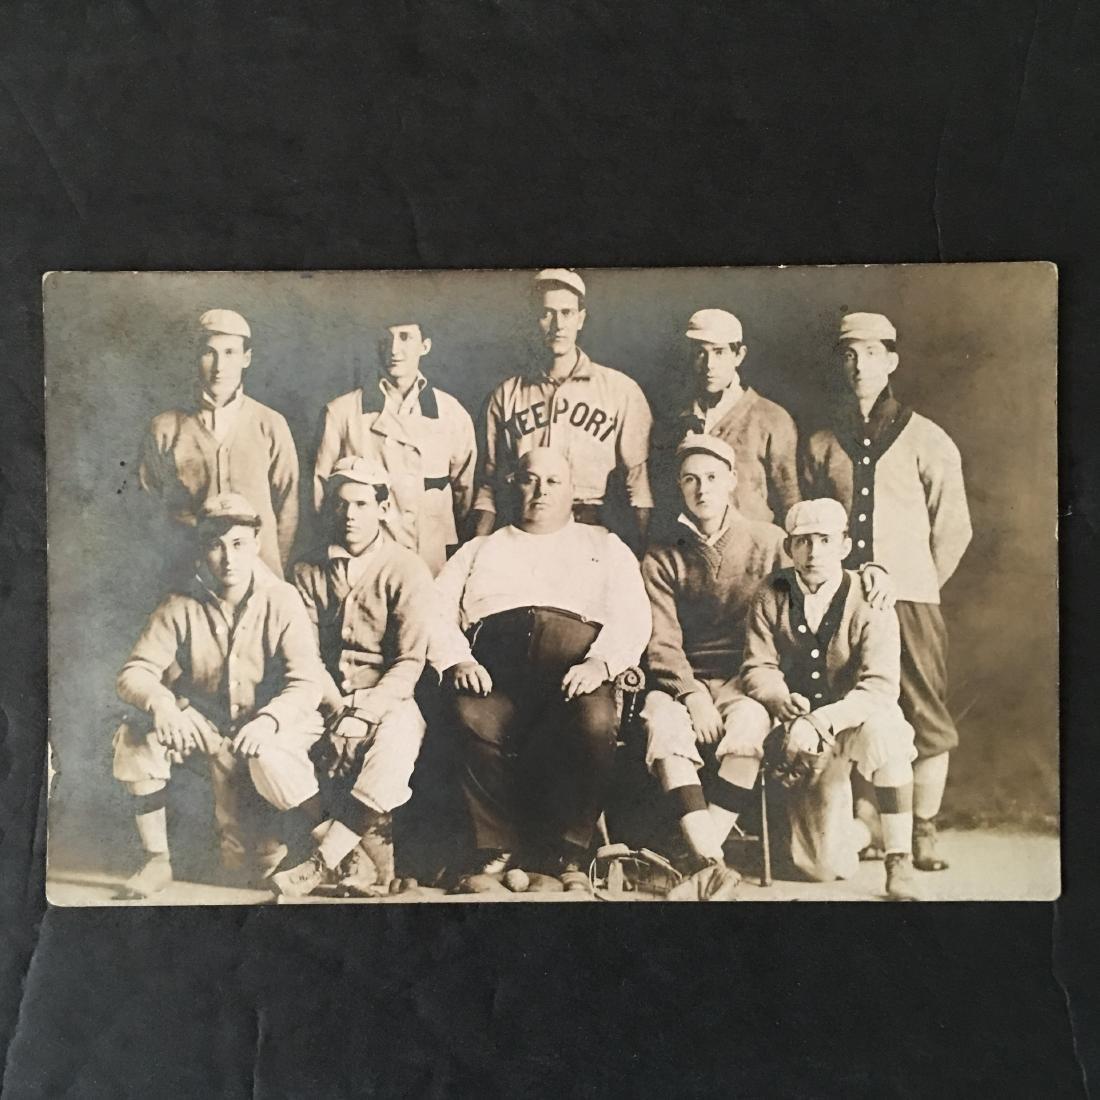 EARLY 1900'S BASEBALL TEAM FREEPORT POST CARD